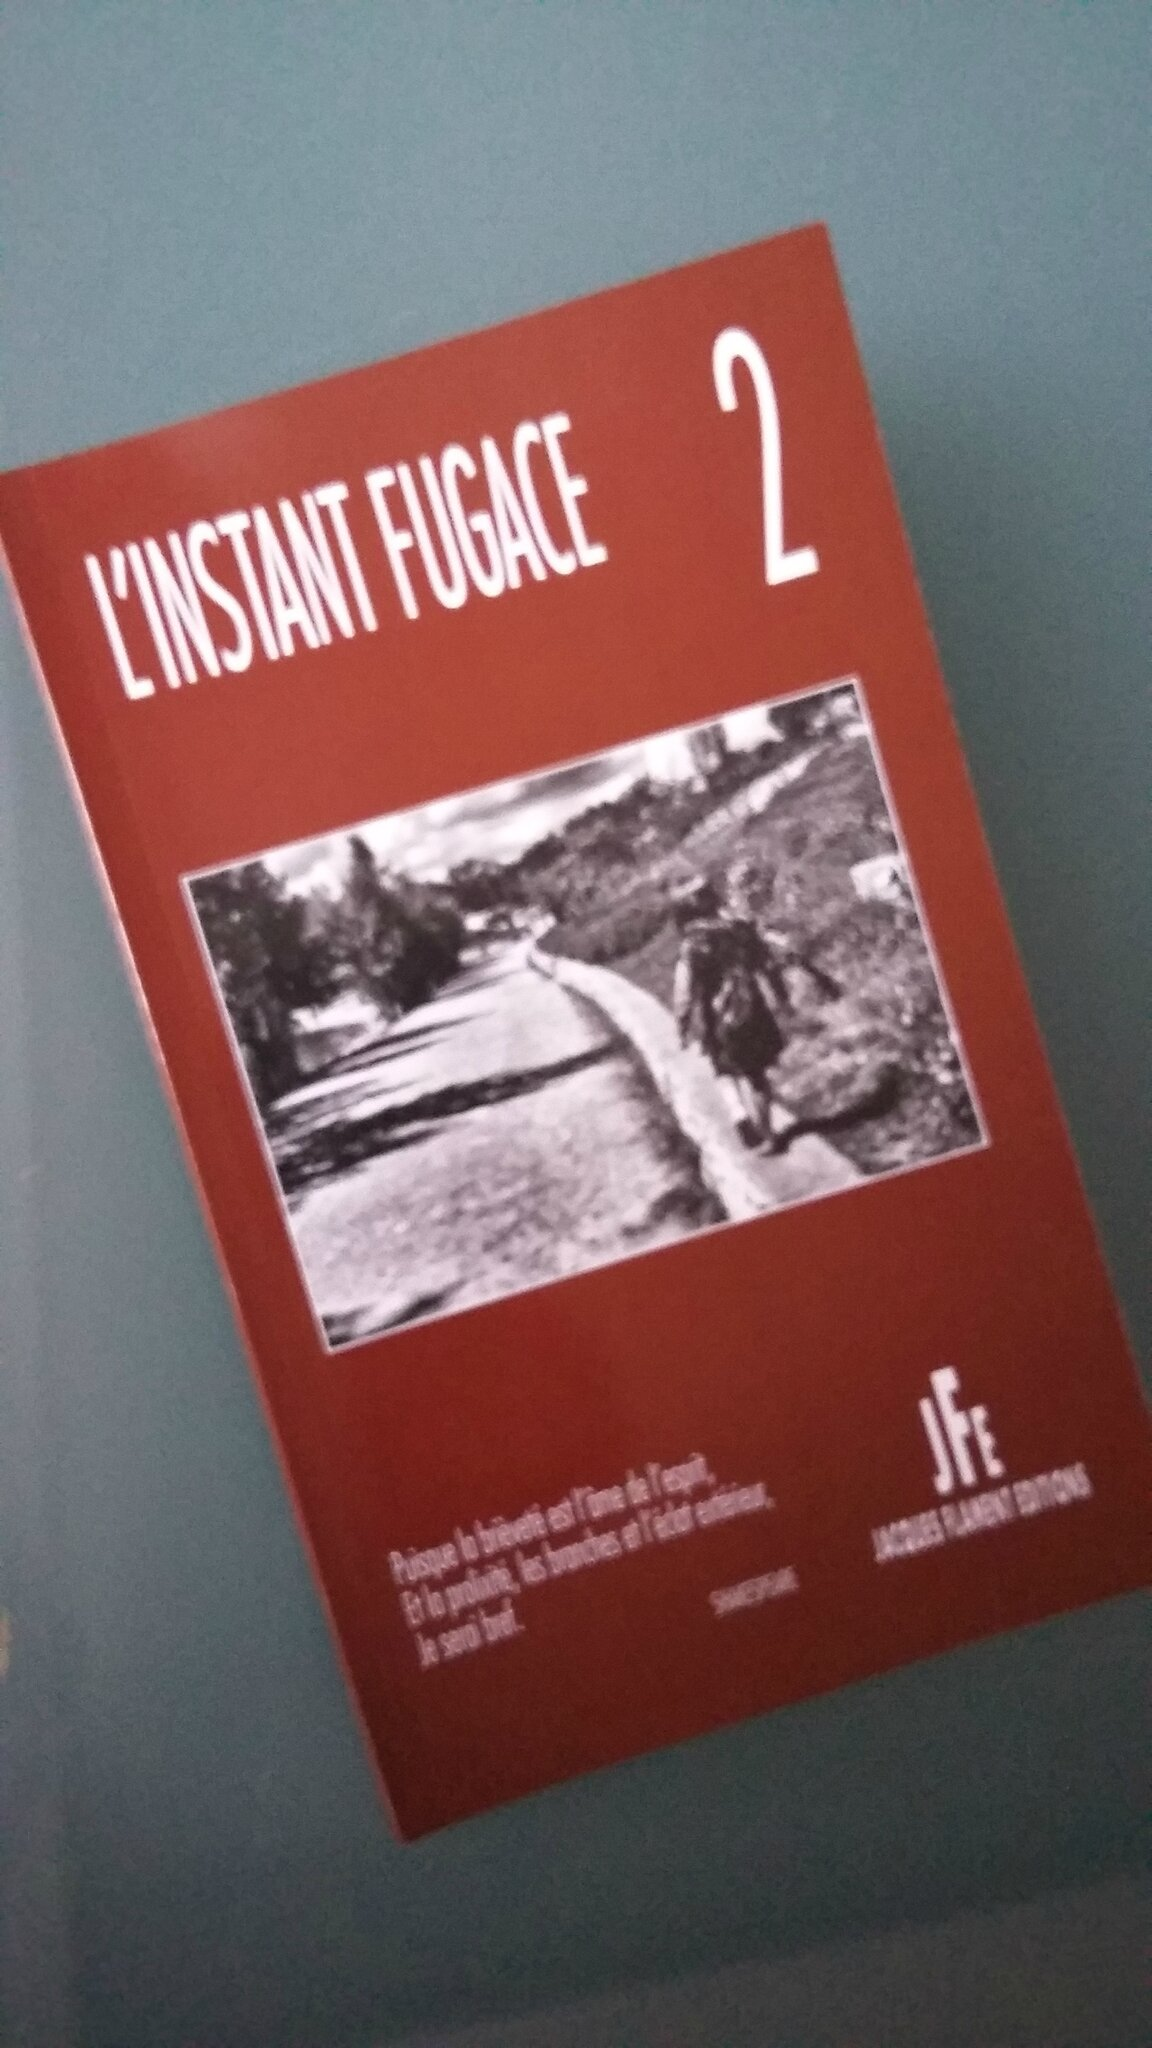 Dans L'Instant Fugace 2 (Editions Jacques Flament), deux textes de C.-L. Desguin